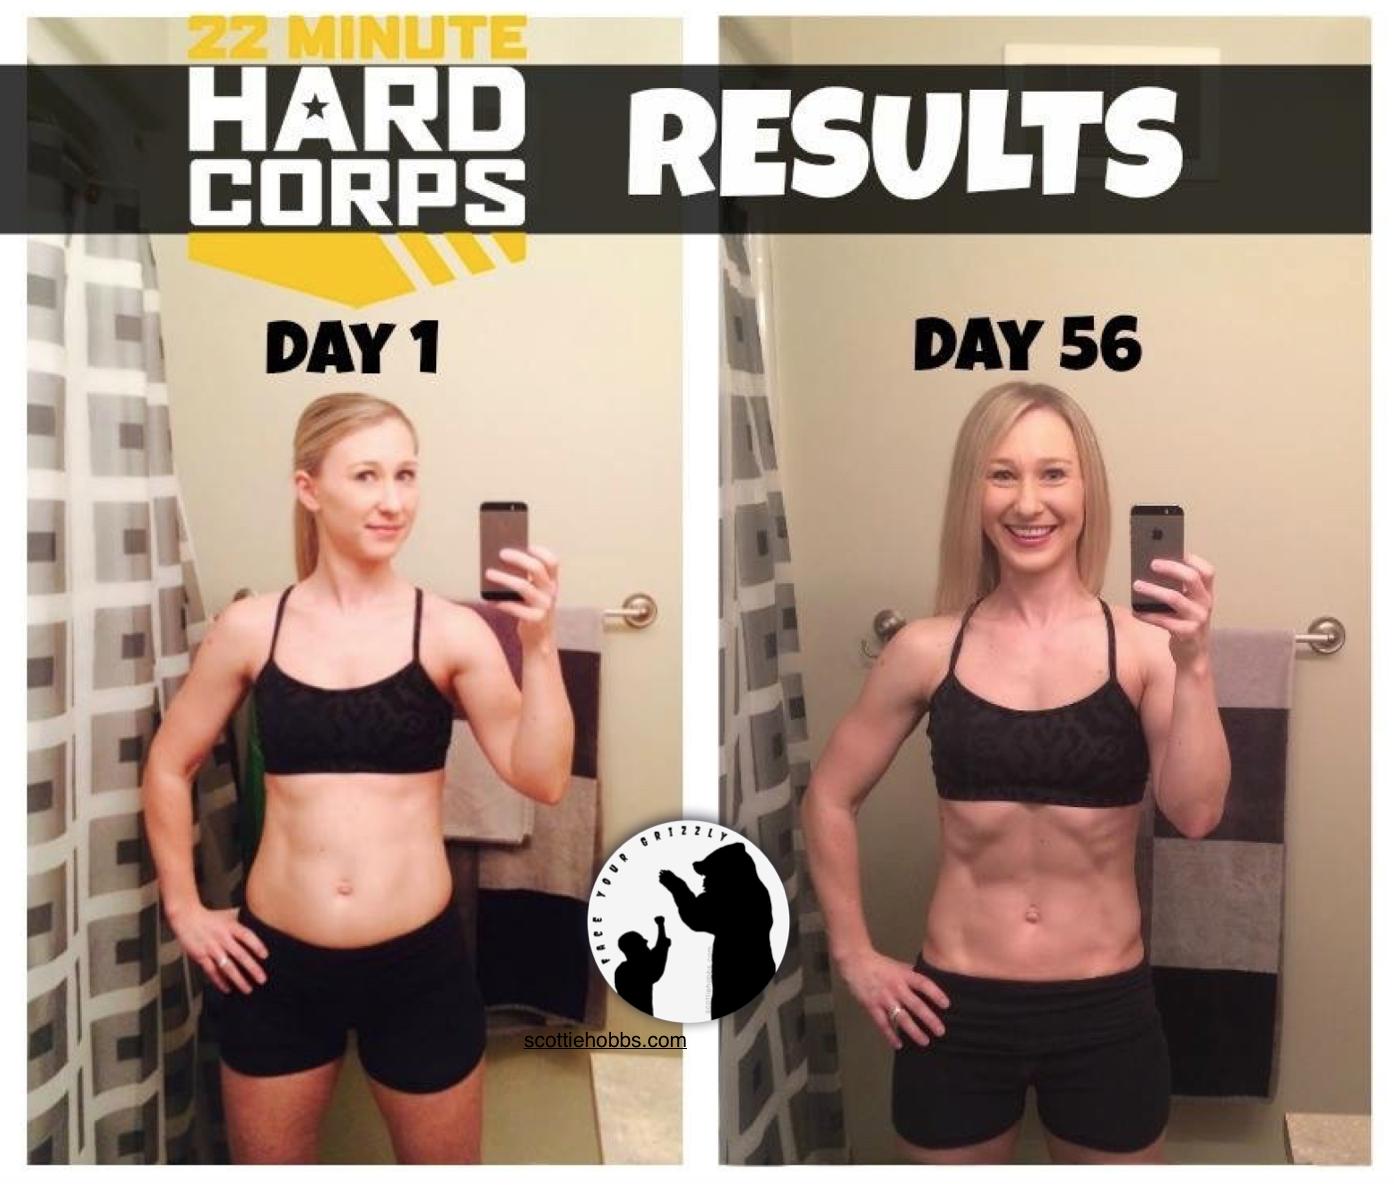 22 Minute Hard Corps Workout Program